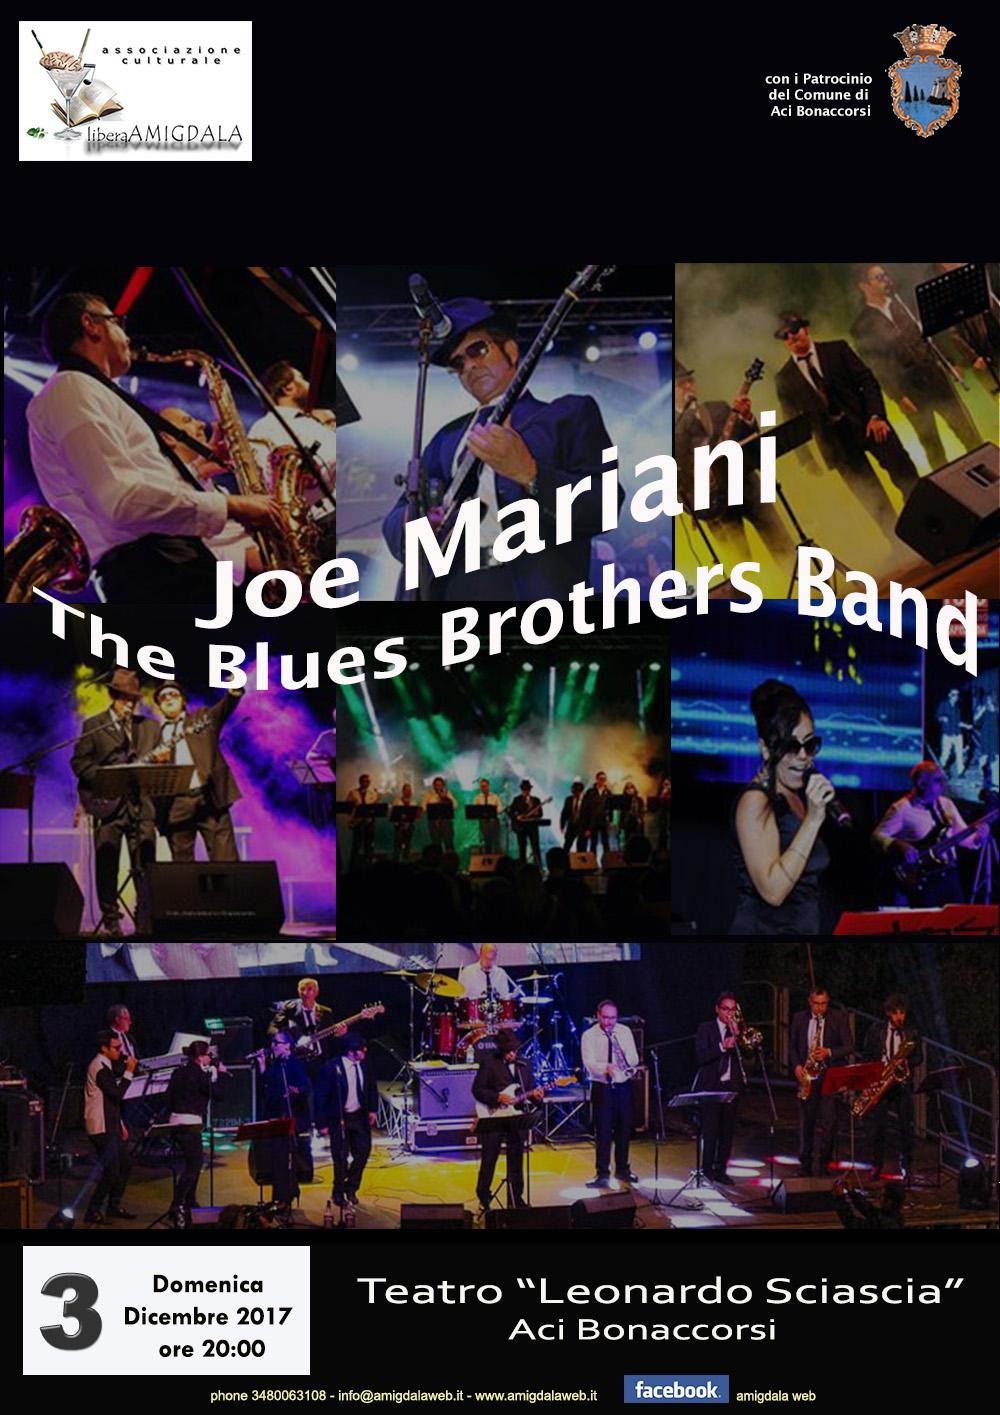 Amigdala presenta: Joe Mariani The Blues Brothers Band